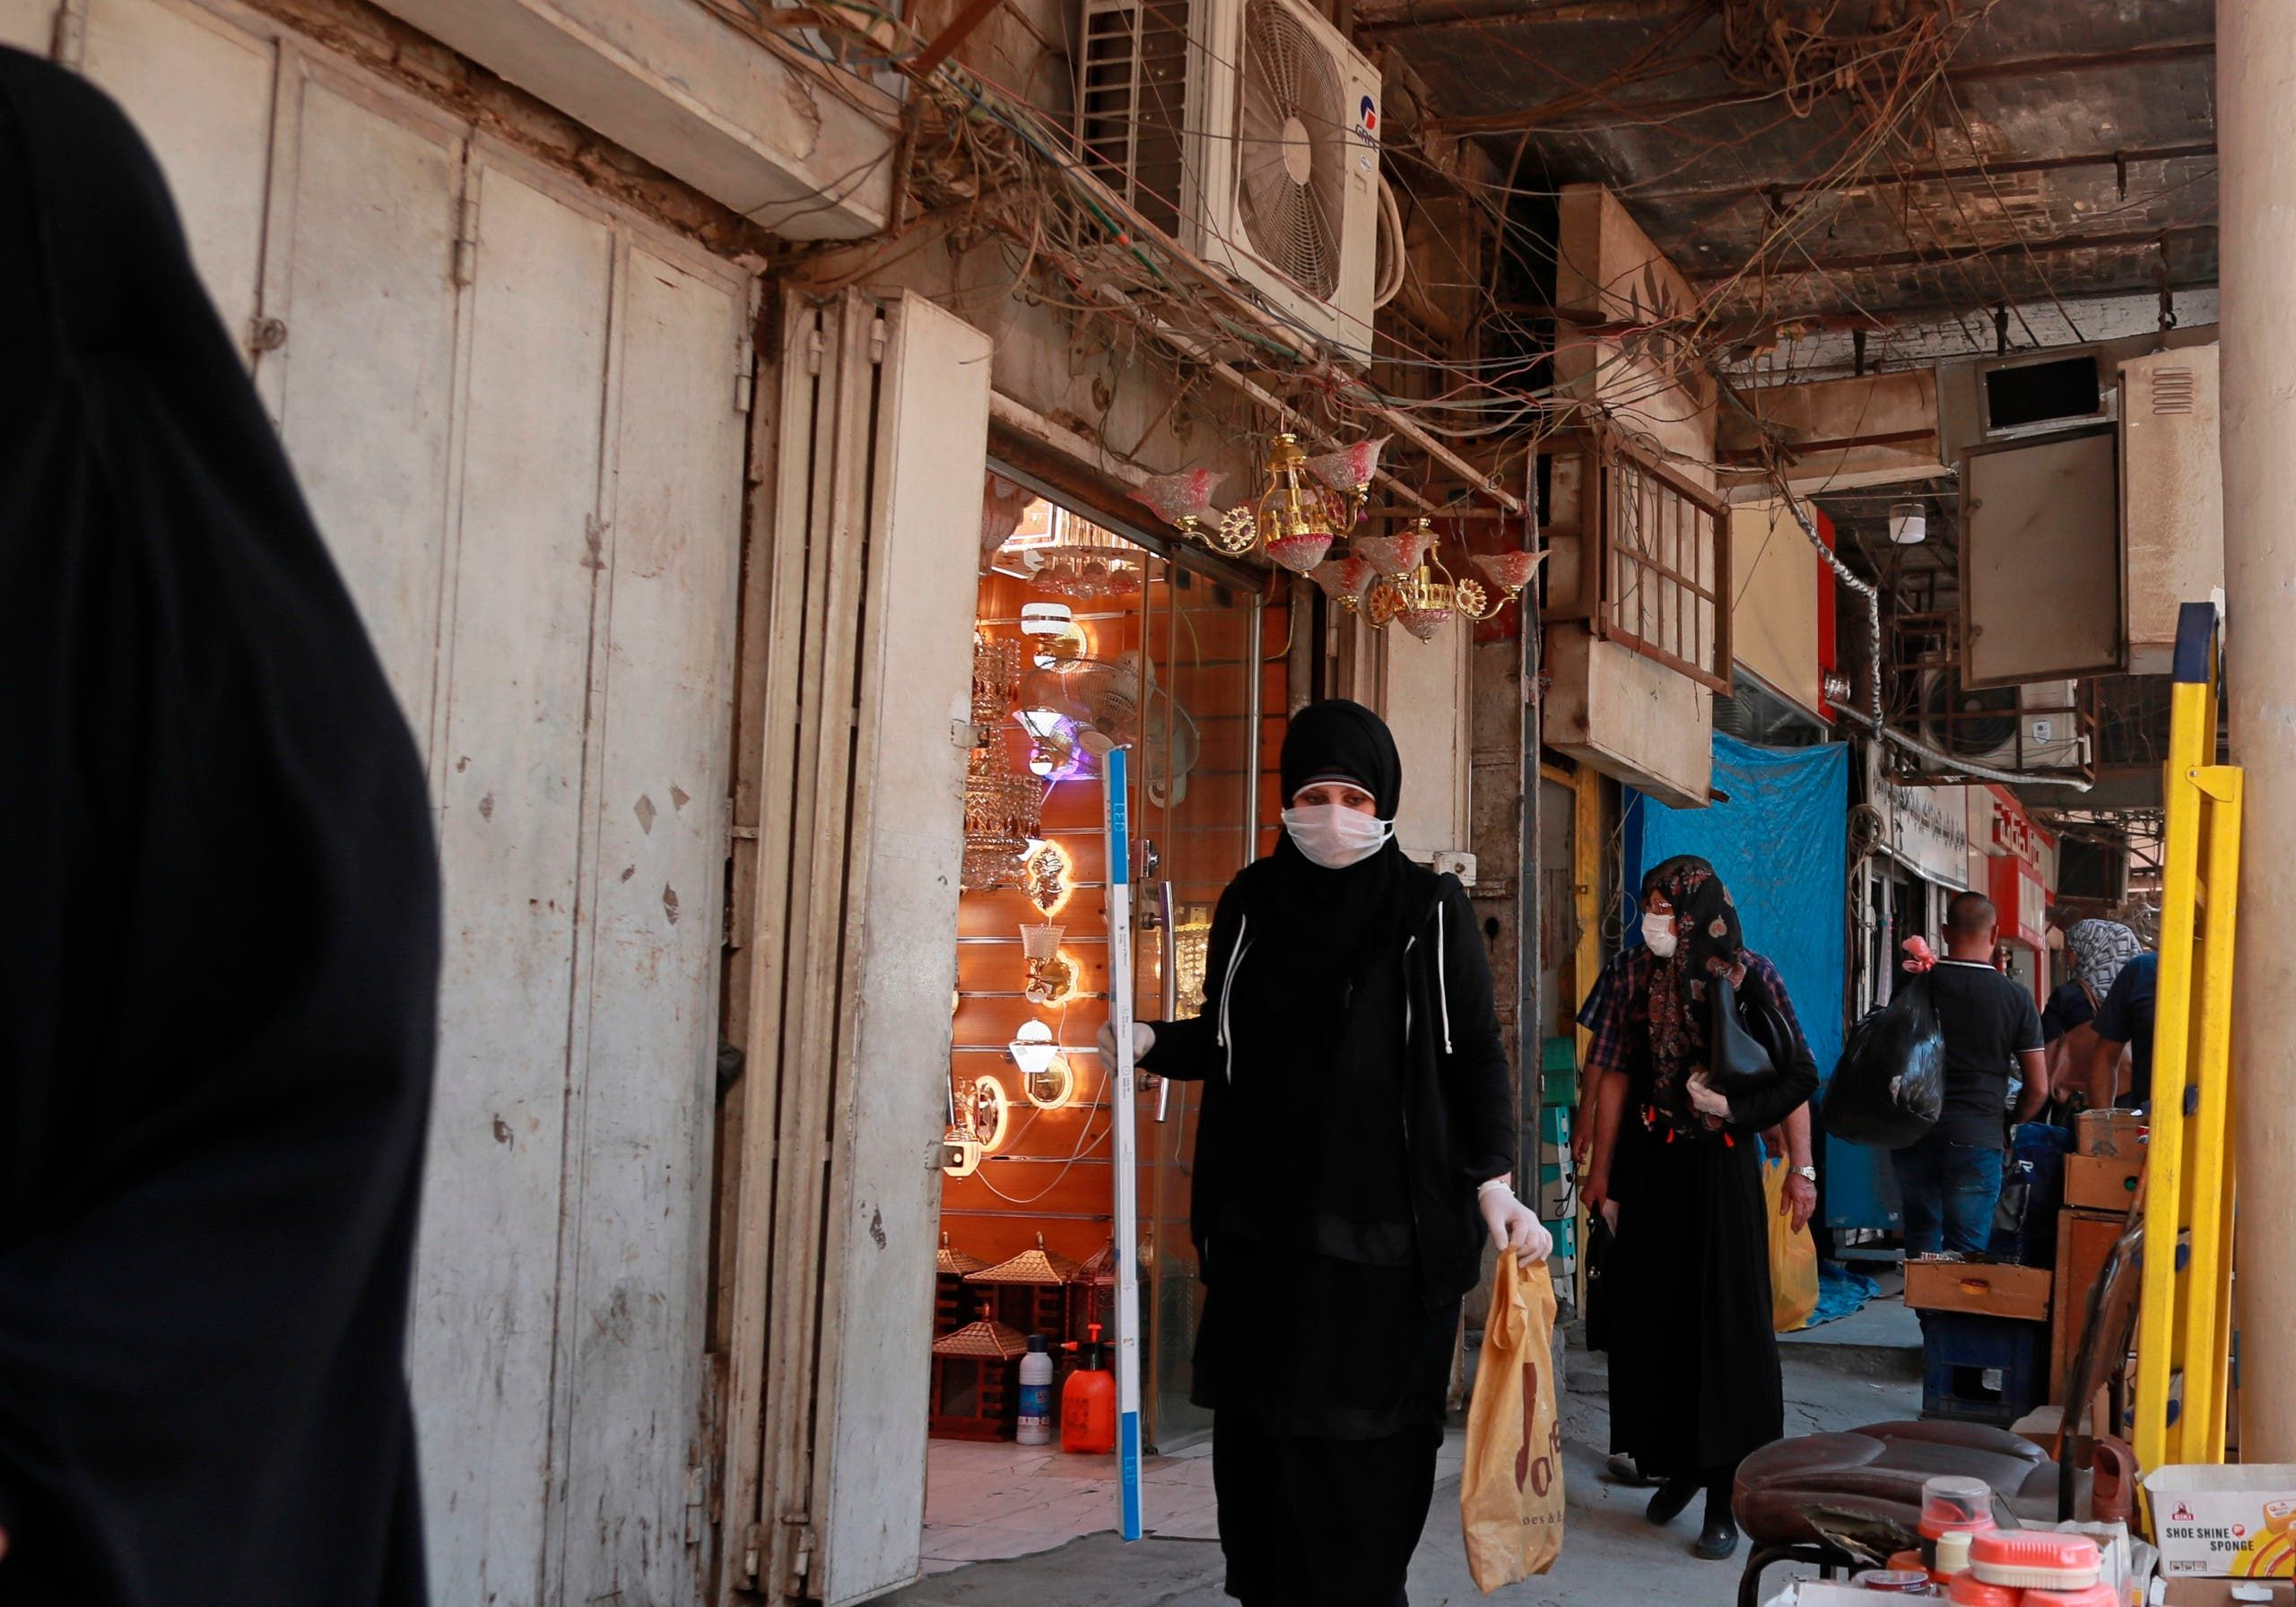 بغداد - اسوشيد برس